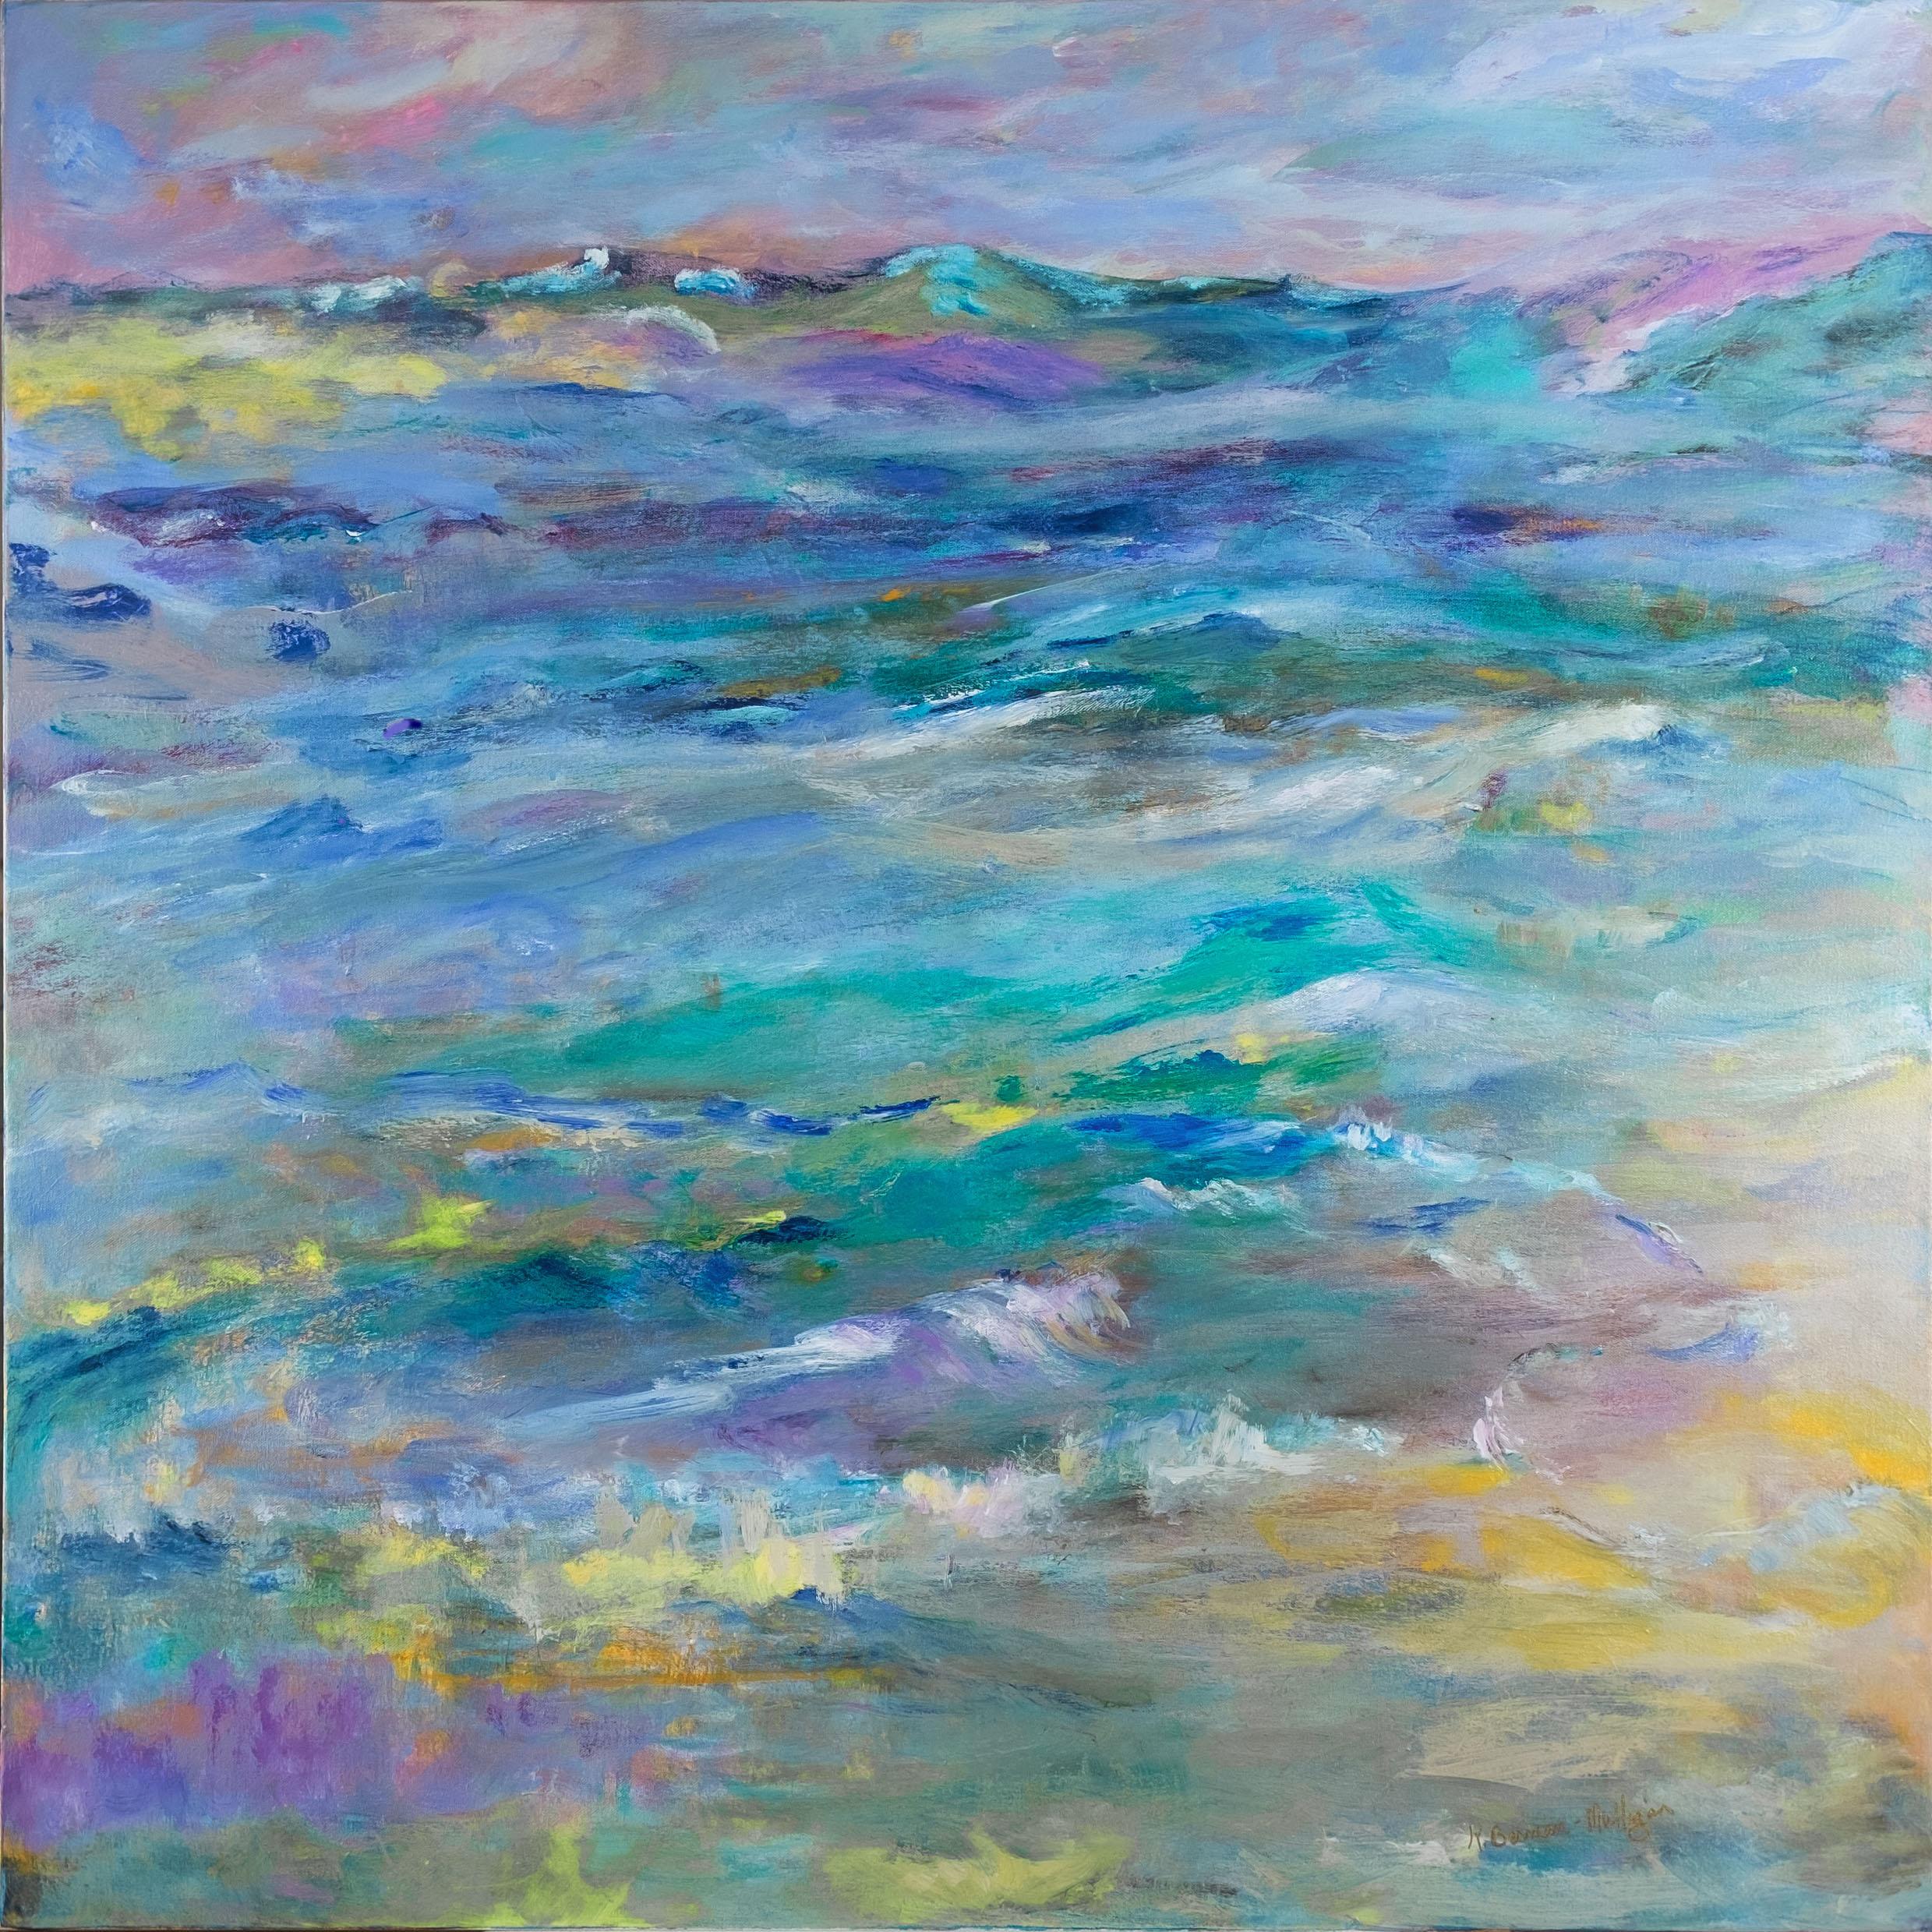 "<p><strong>KAREN BERMAN-MULLIGAN</strong>acrylic painting<a href=""/karen-bermanmulligan"">More →</a></p>"